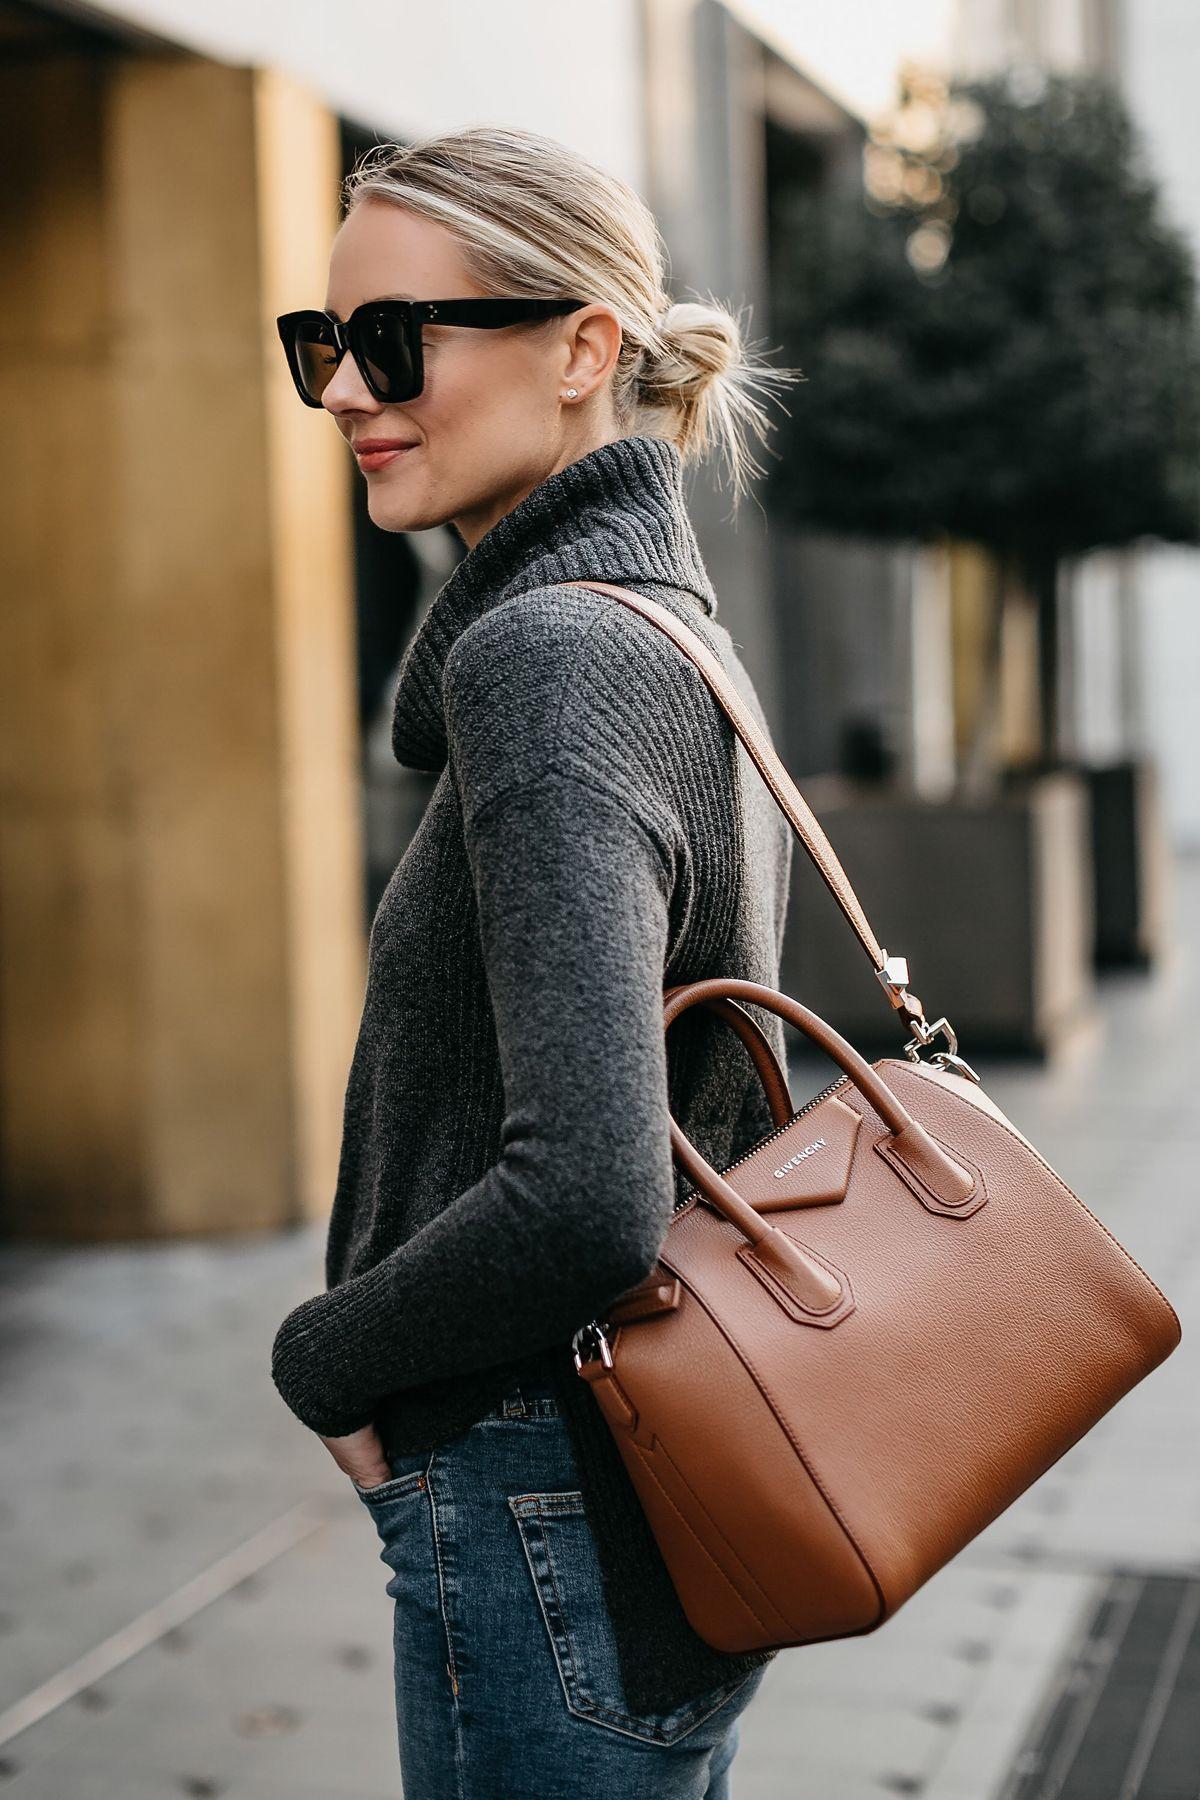 fb2d792fd Blonde Woman Wearing Grey Turtleneck Sweater Givenchy Antigona Cognac  Handbag Fashion Jackson Dallas Blogger Fashion Blogger Street Style